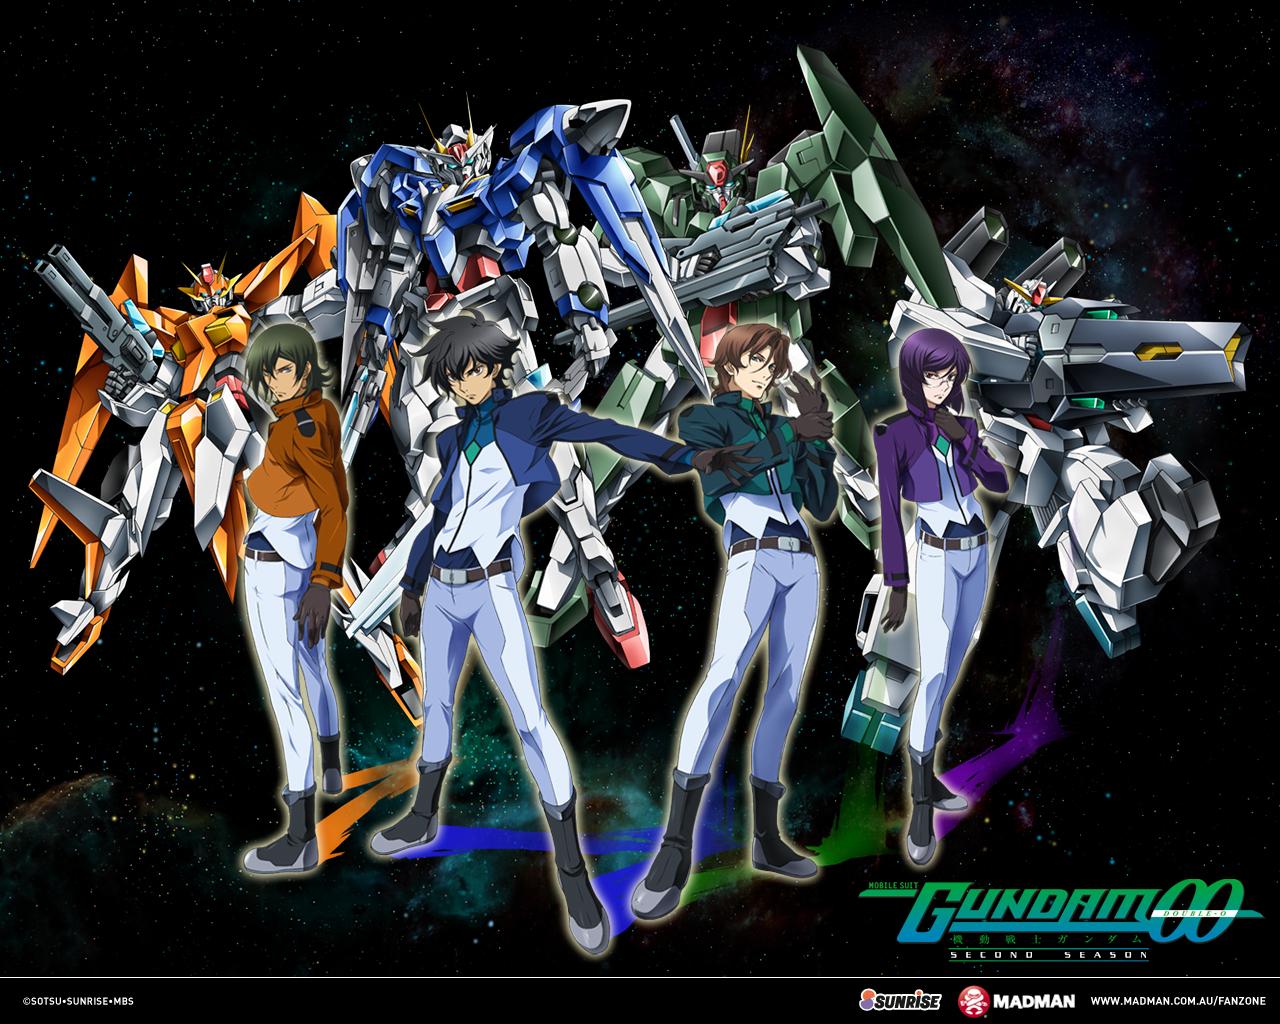 Mobile Suit Gundam โมบิลสูท กันดั้ม เรียงภาค ทุกภาค